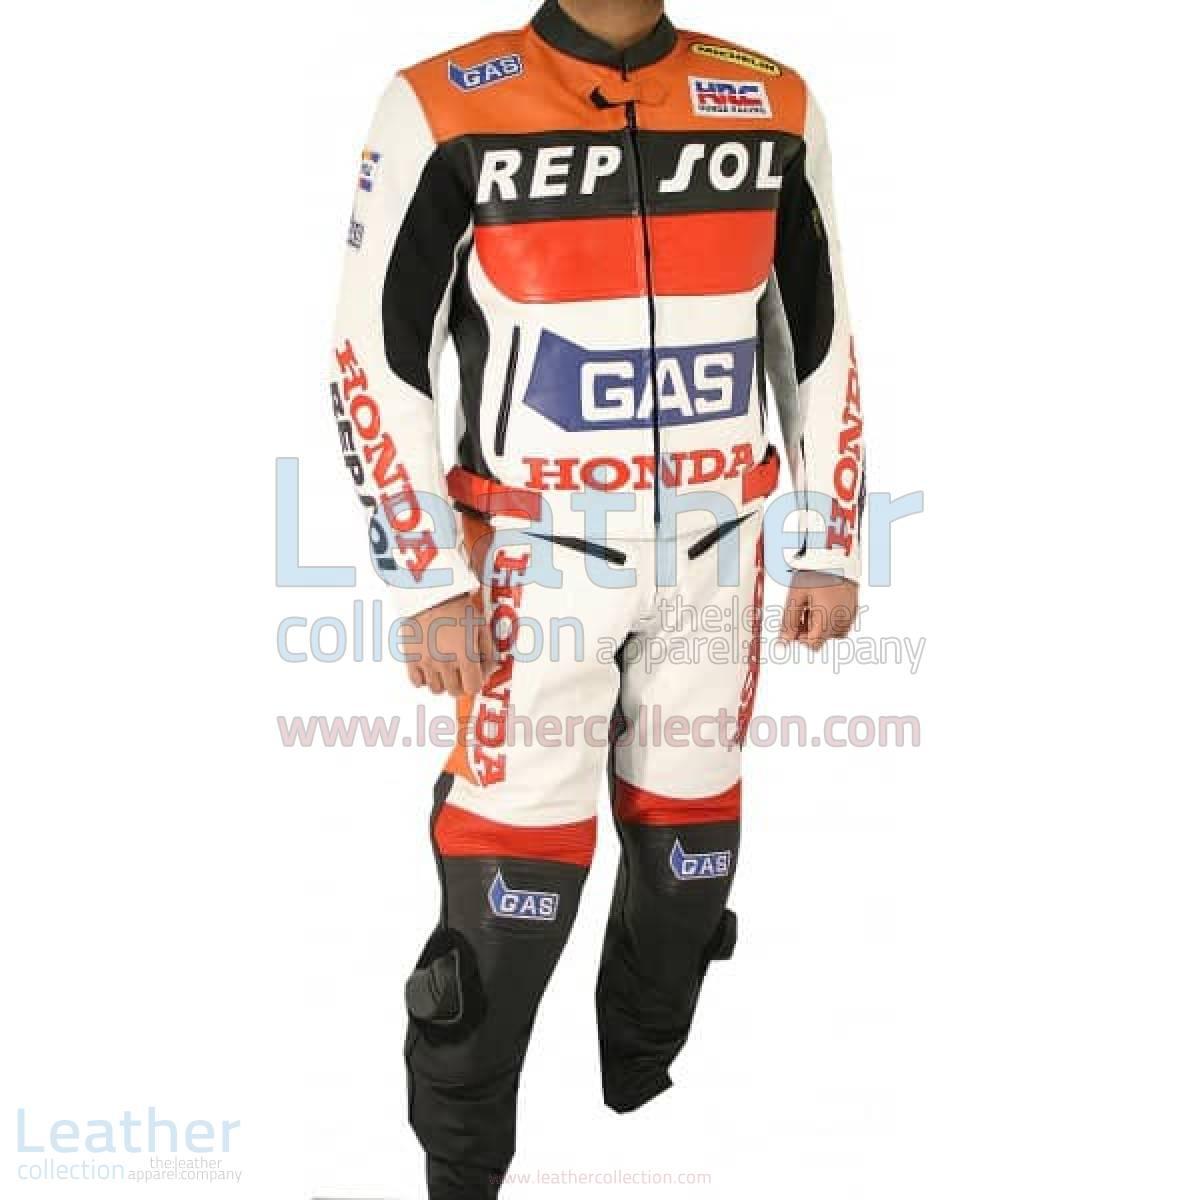 Honda Repsol Gas Leather Suit